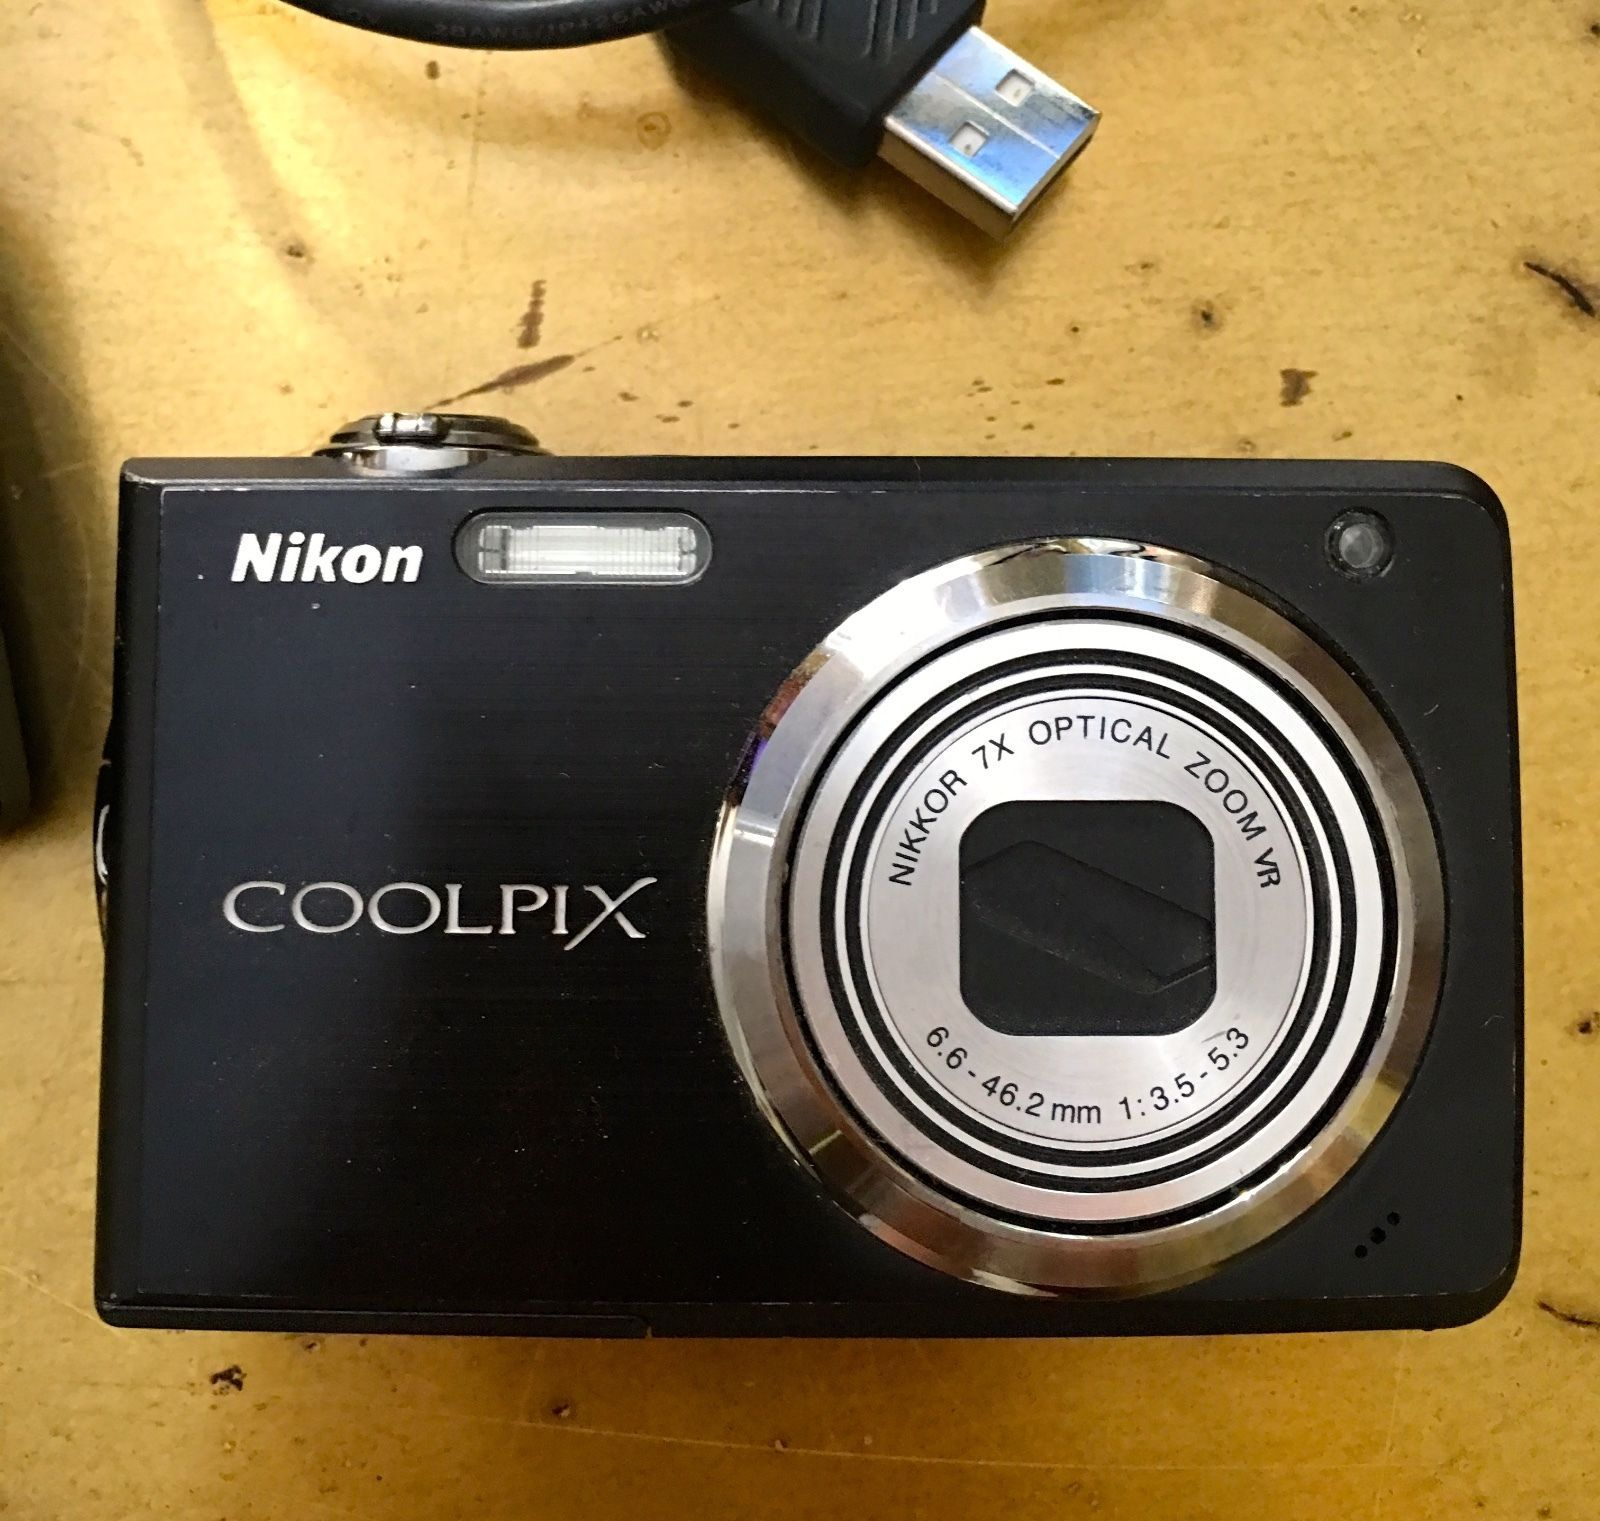 Nikon COOLPIX S630 12.0 MP Digital Camera - Black https://t.co/DKMD5a77Al https://t.co/WPZnhdBFxY